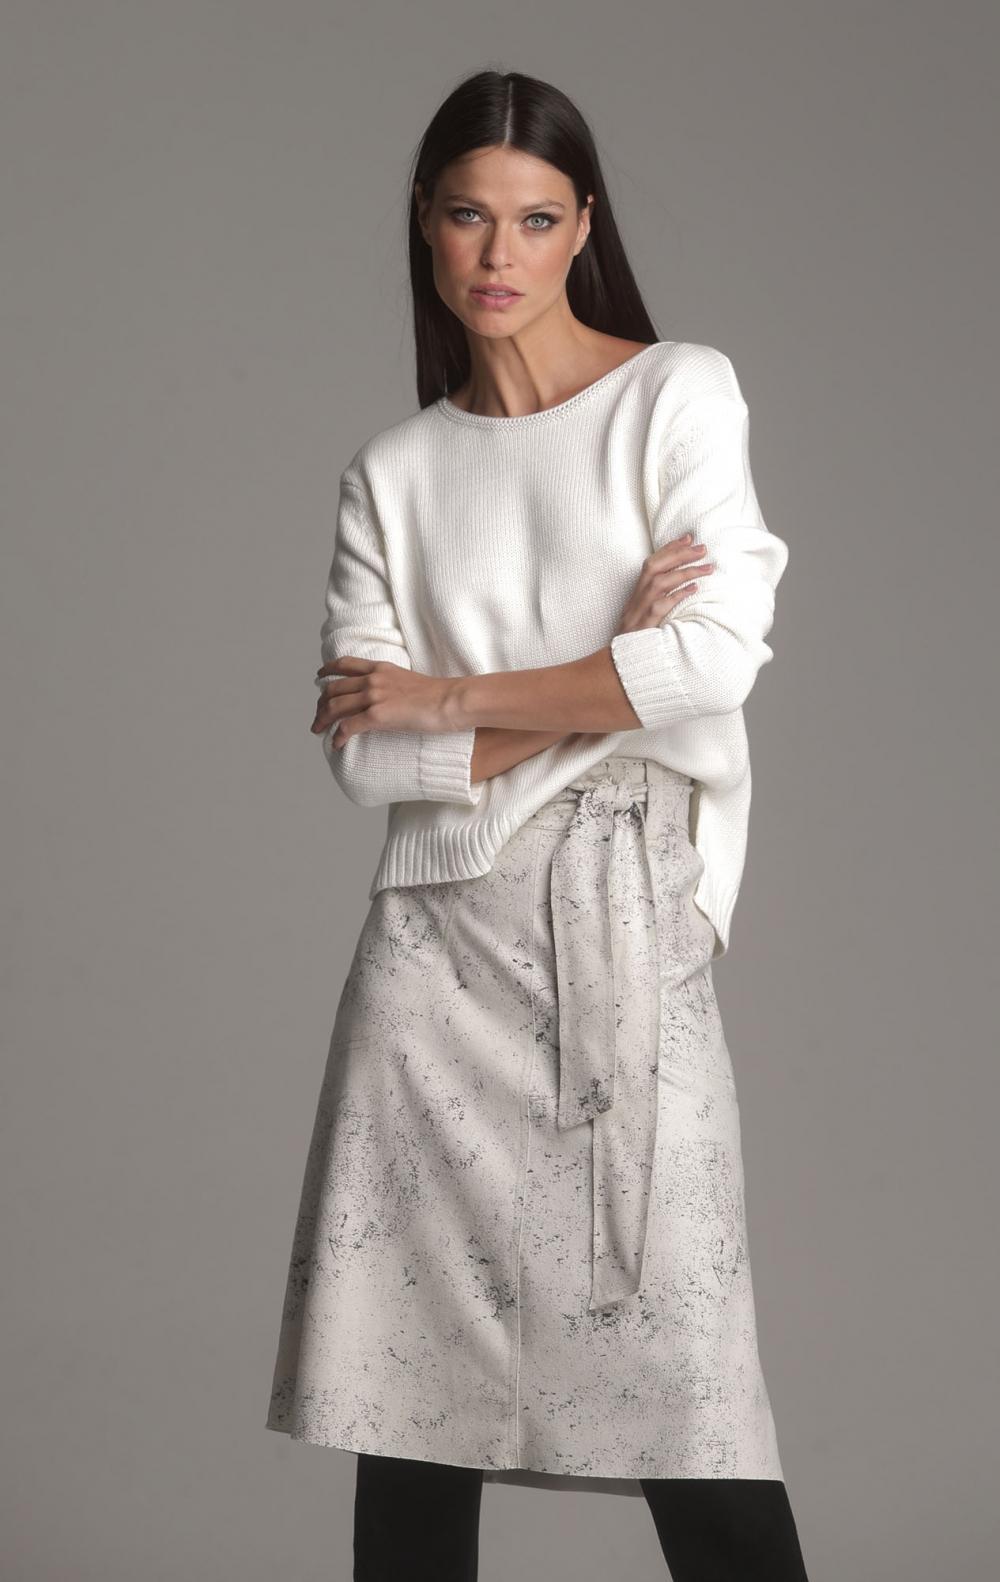 Blusa Tricot Tania Off White - Foto 1